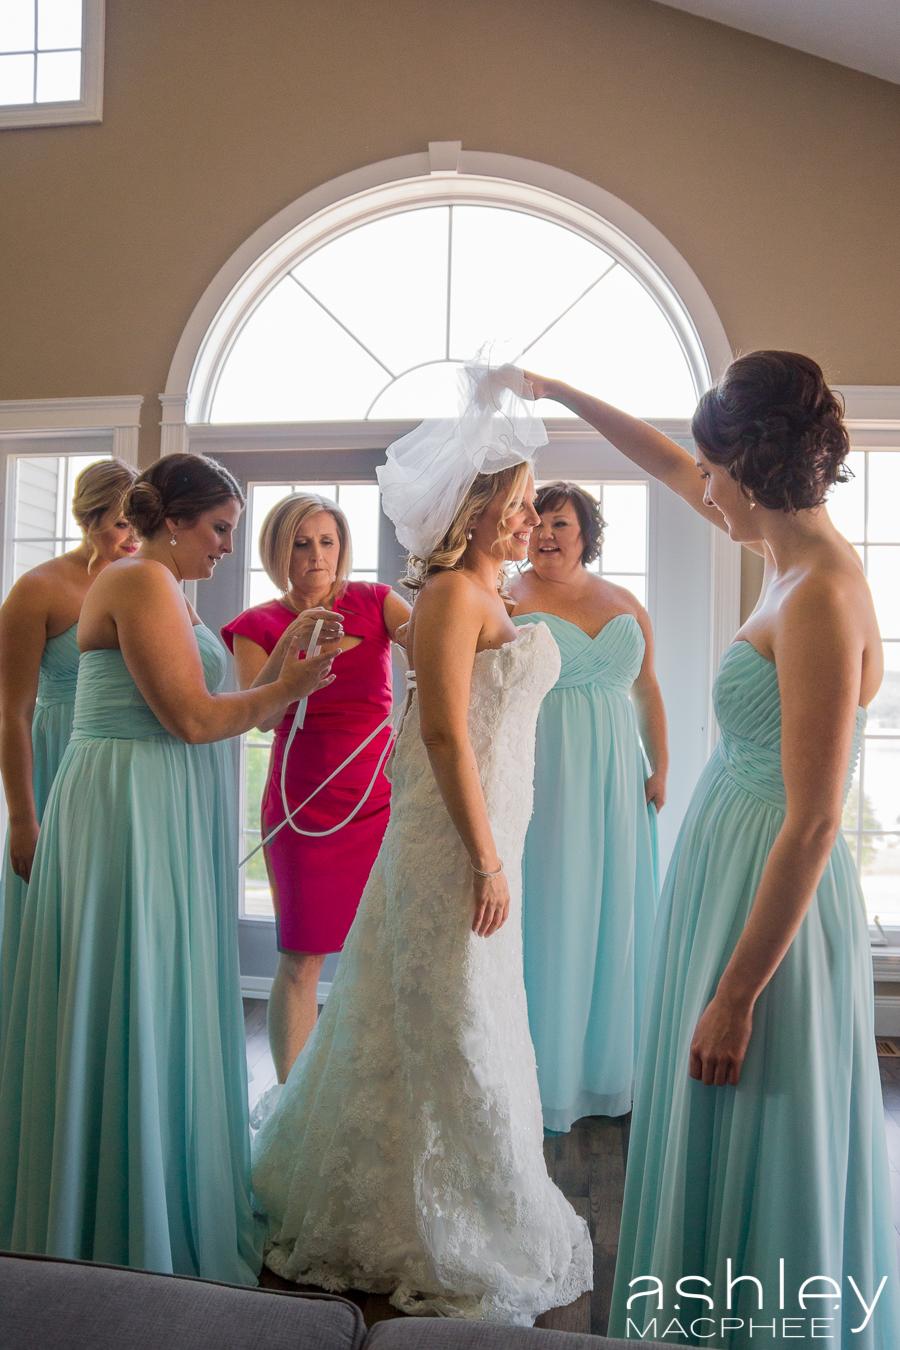 Ashley MacPhee Photography New Brunswick Wedding Photographer (15 of 65).jpg